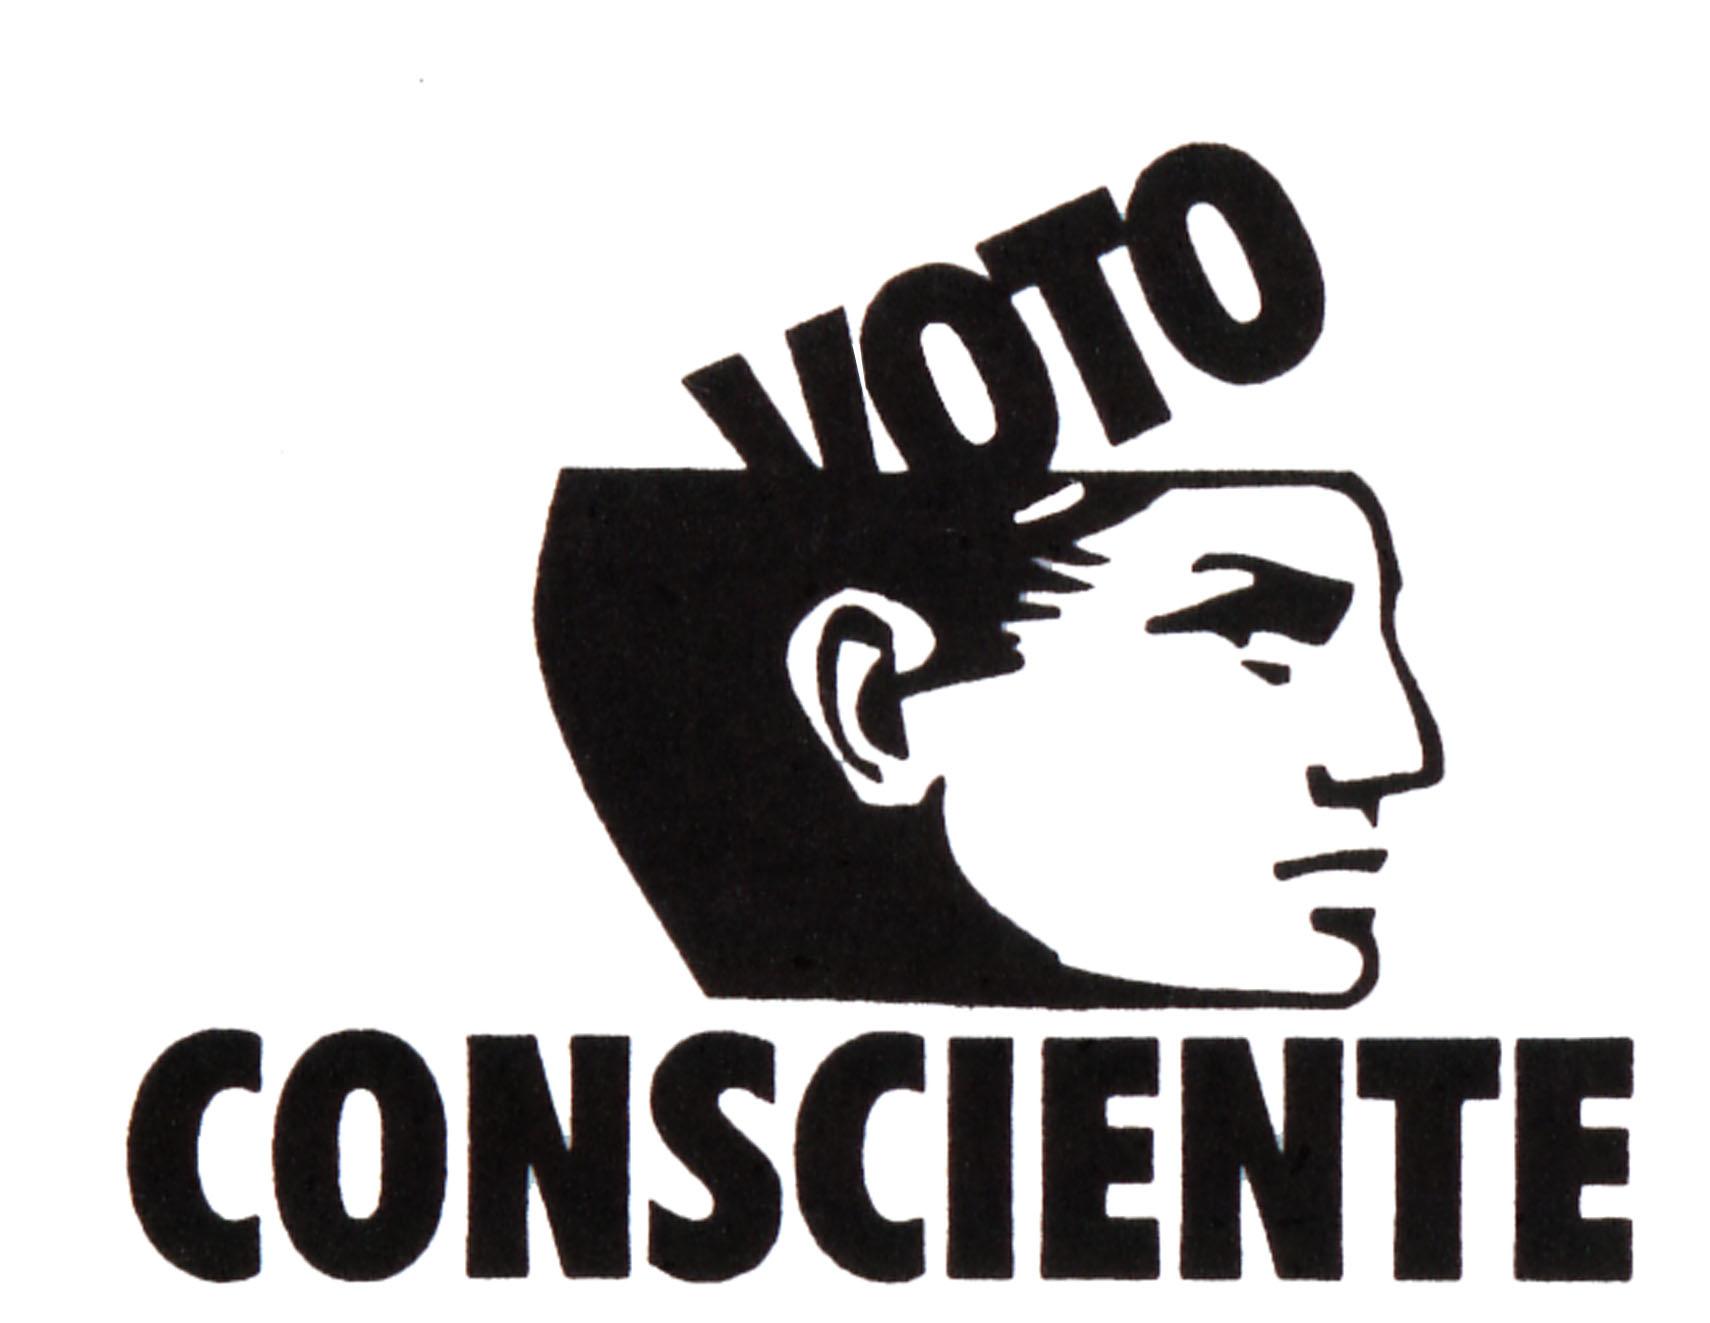 voto-consciente-eleicoes